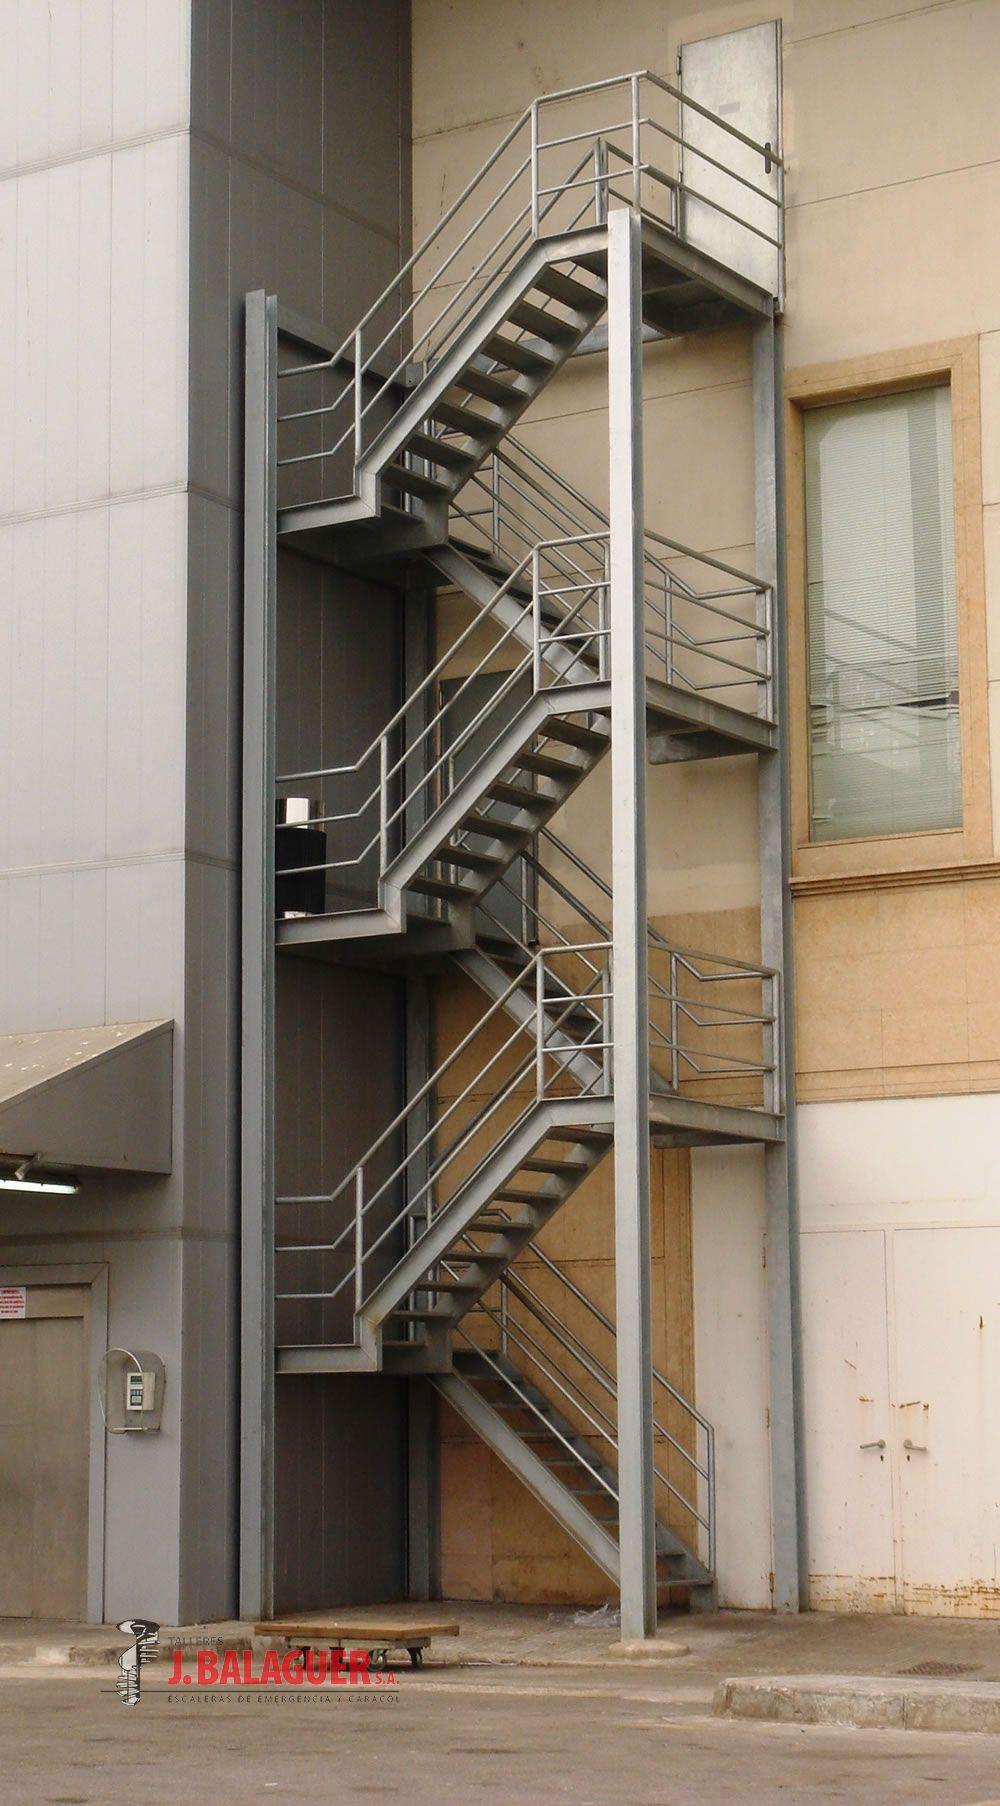 Galerie des escaliers sections droites escaleras balaguer - Escaleras balaguer ...